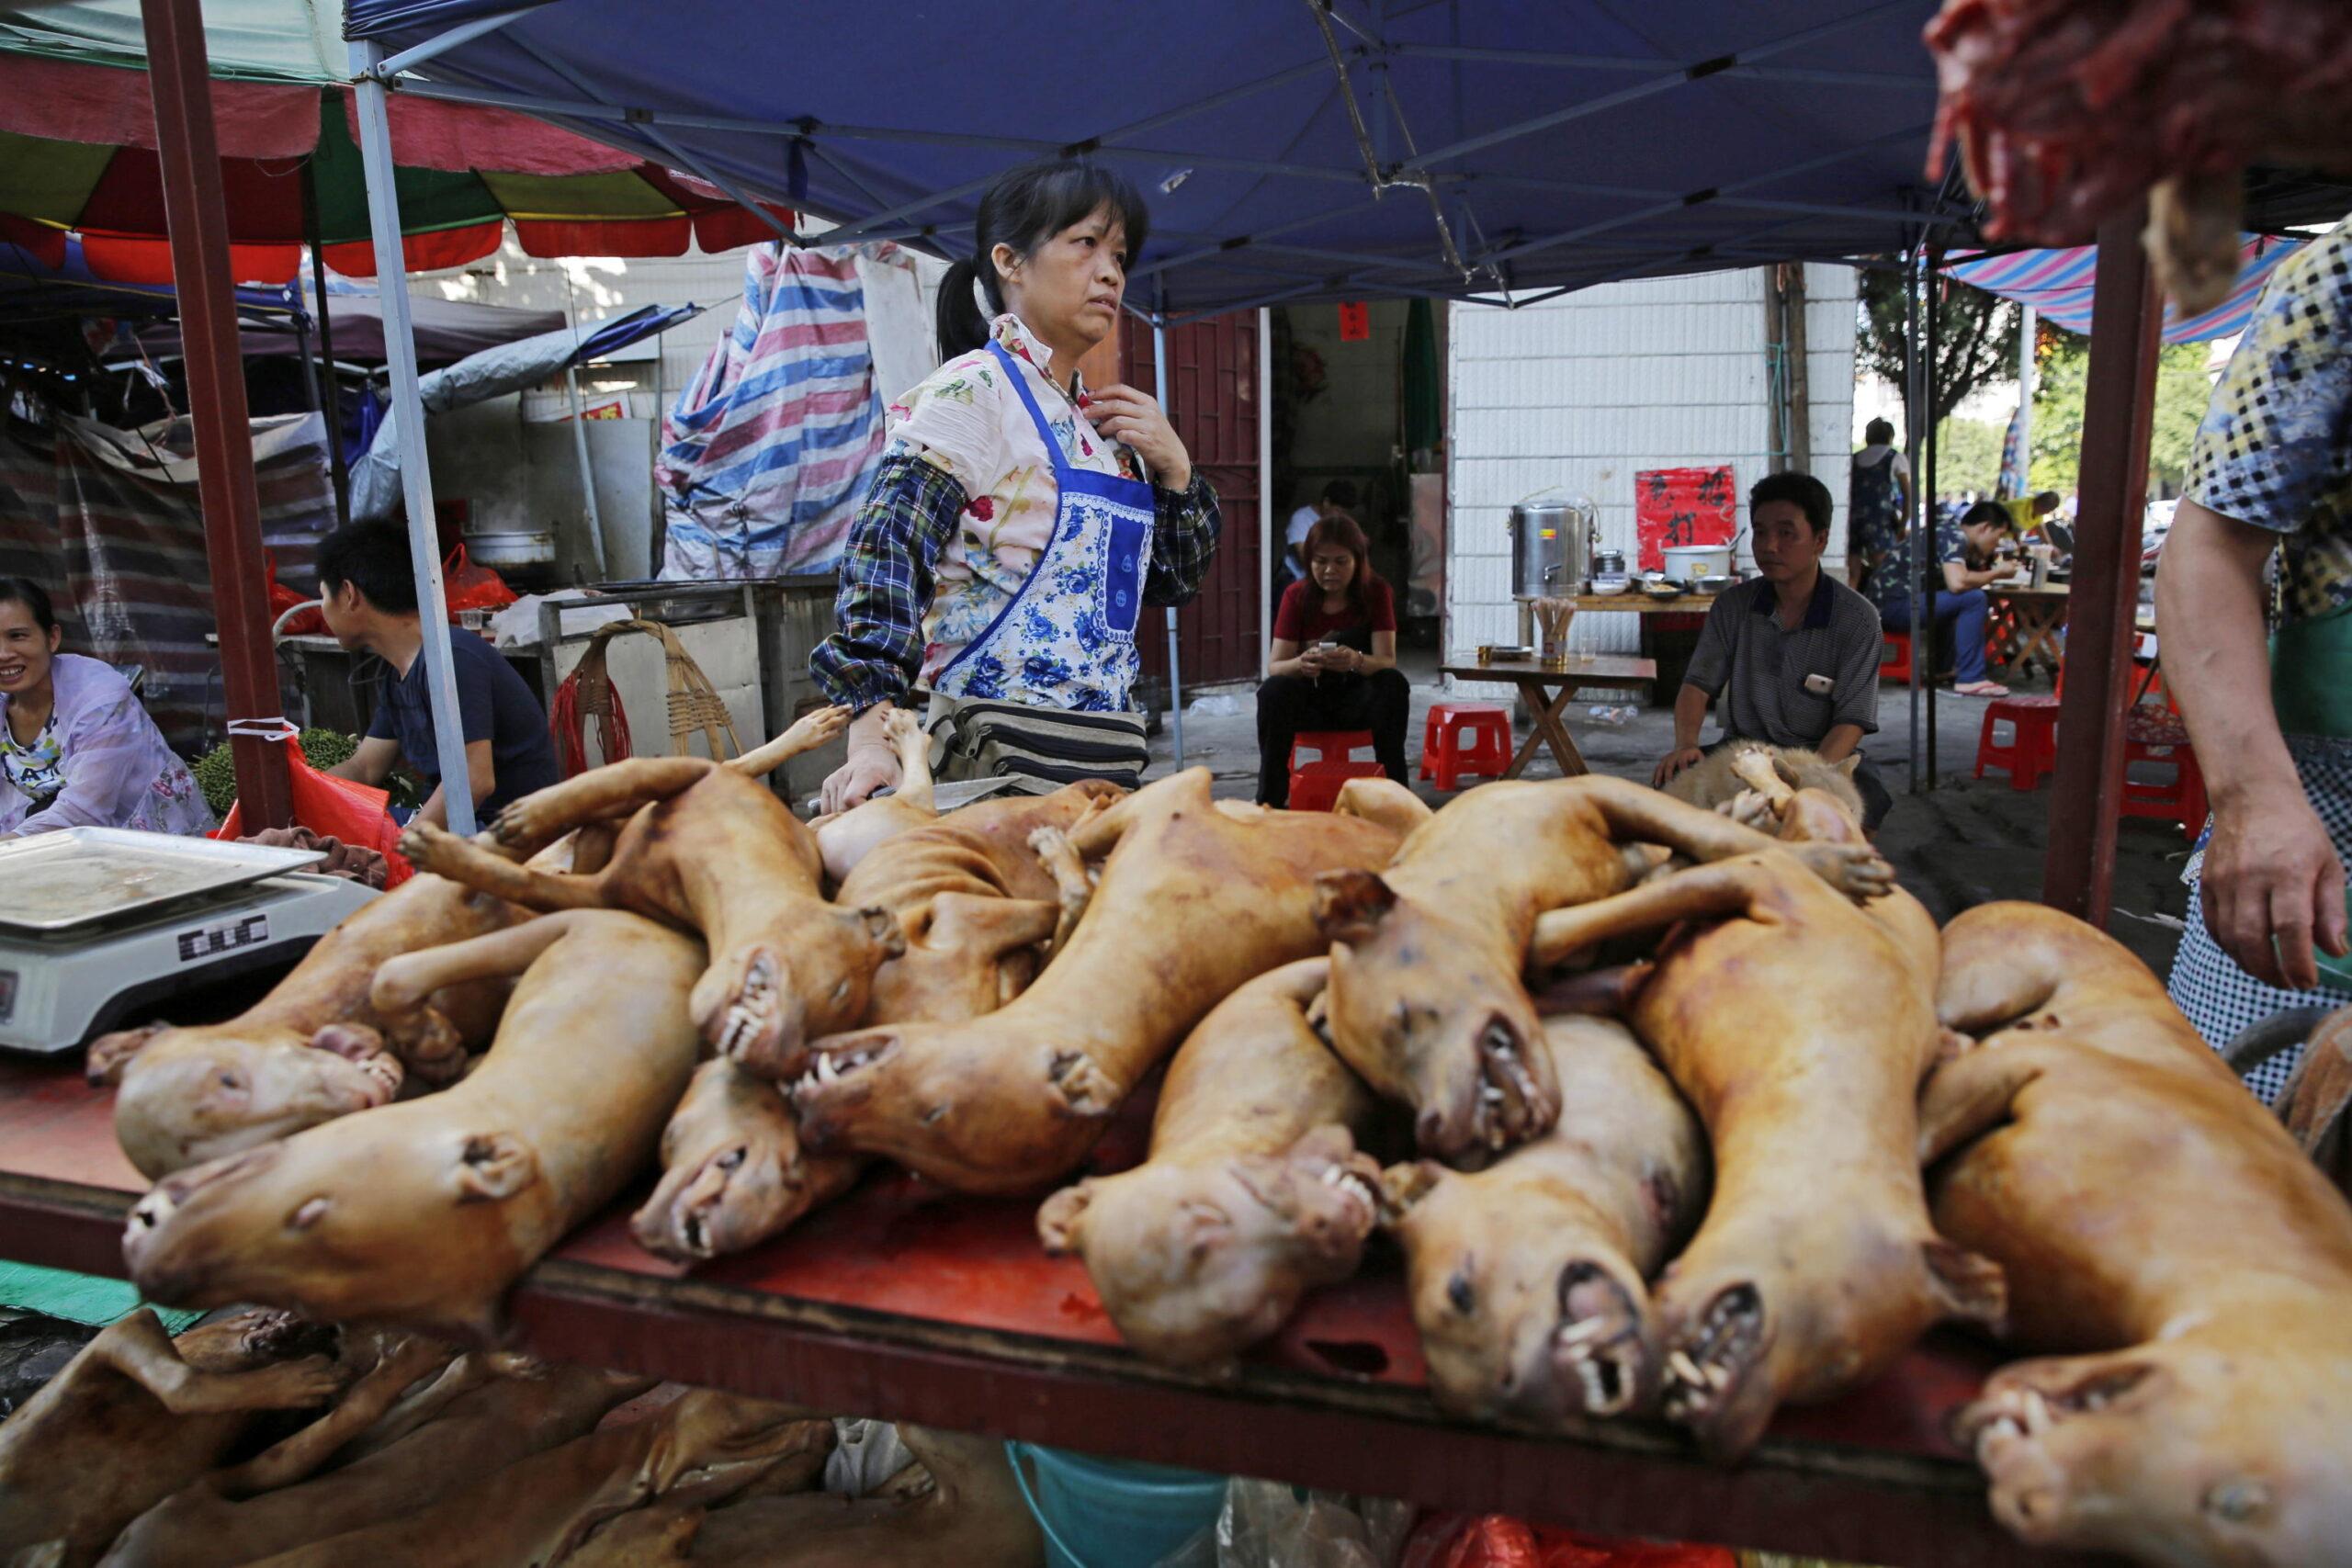 commercio di carne di cane in cina